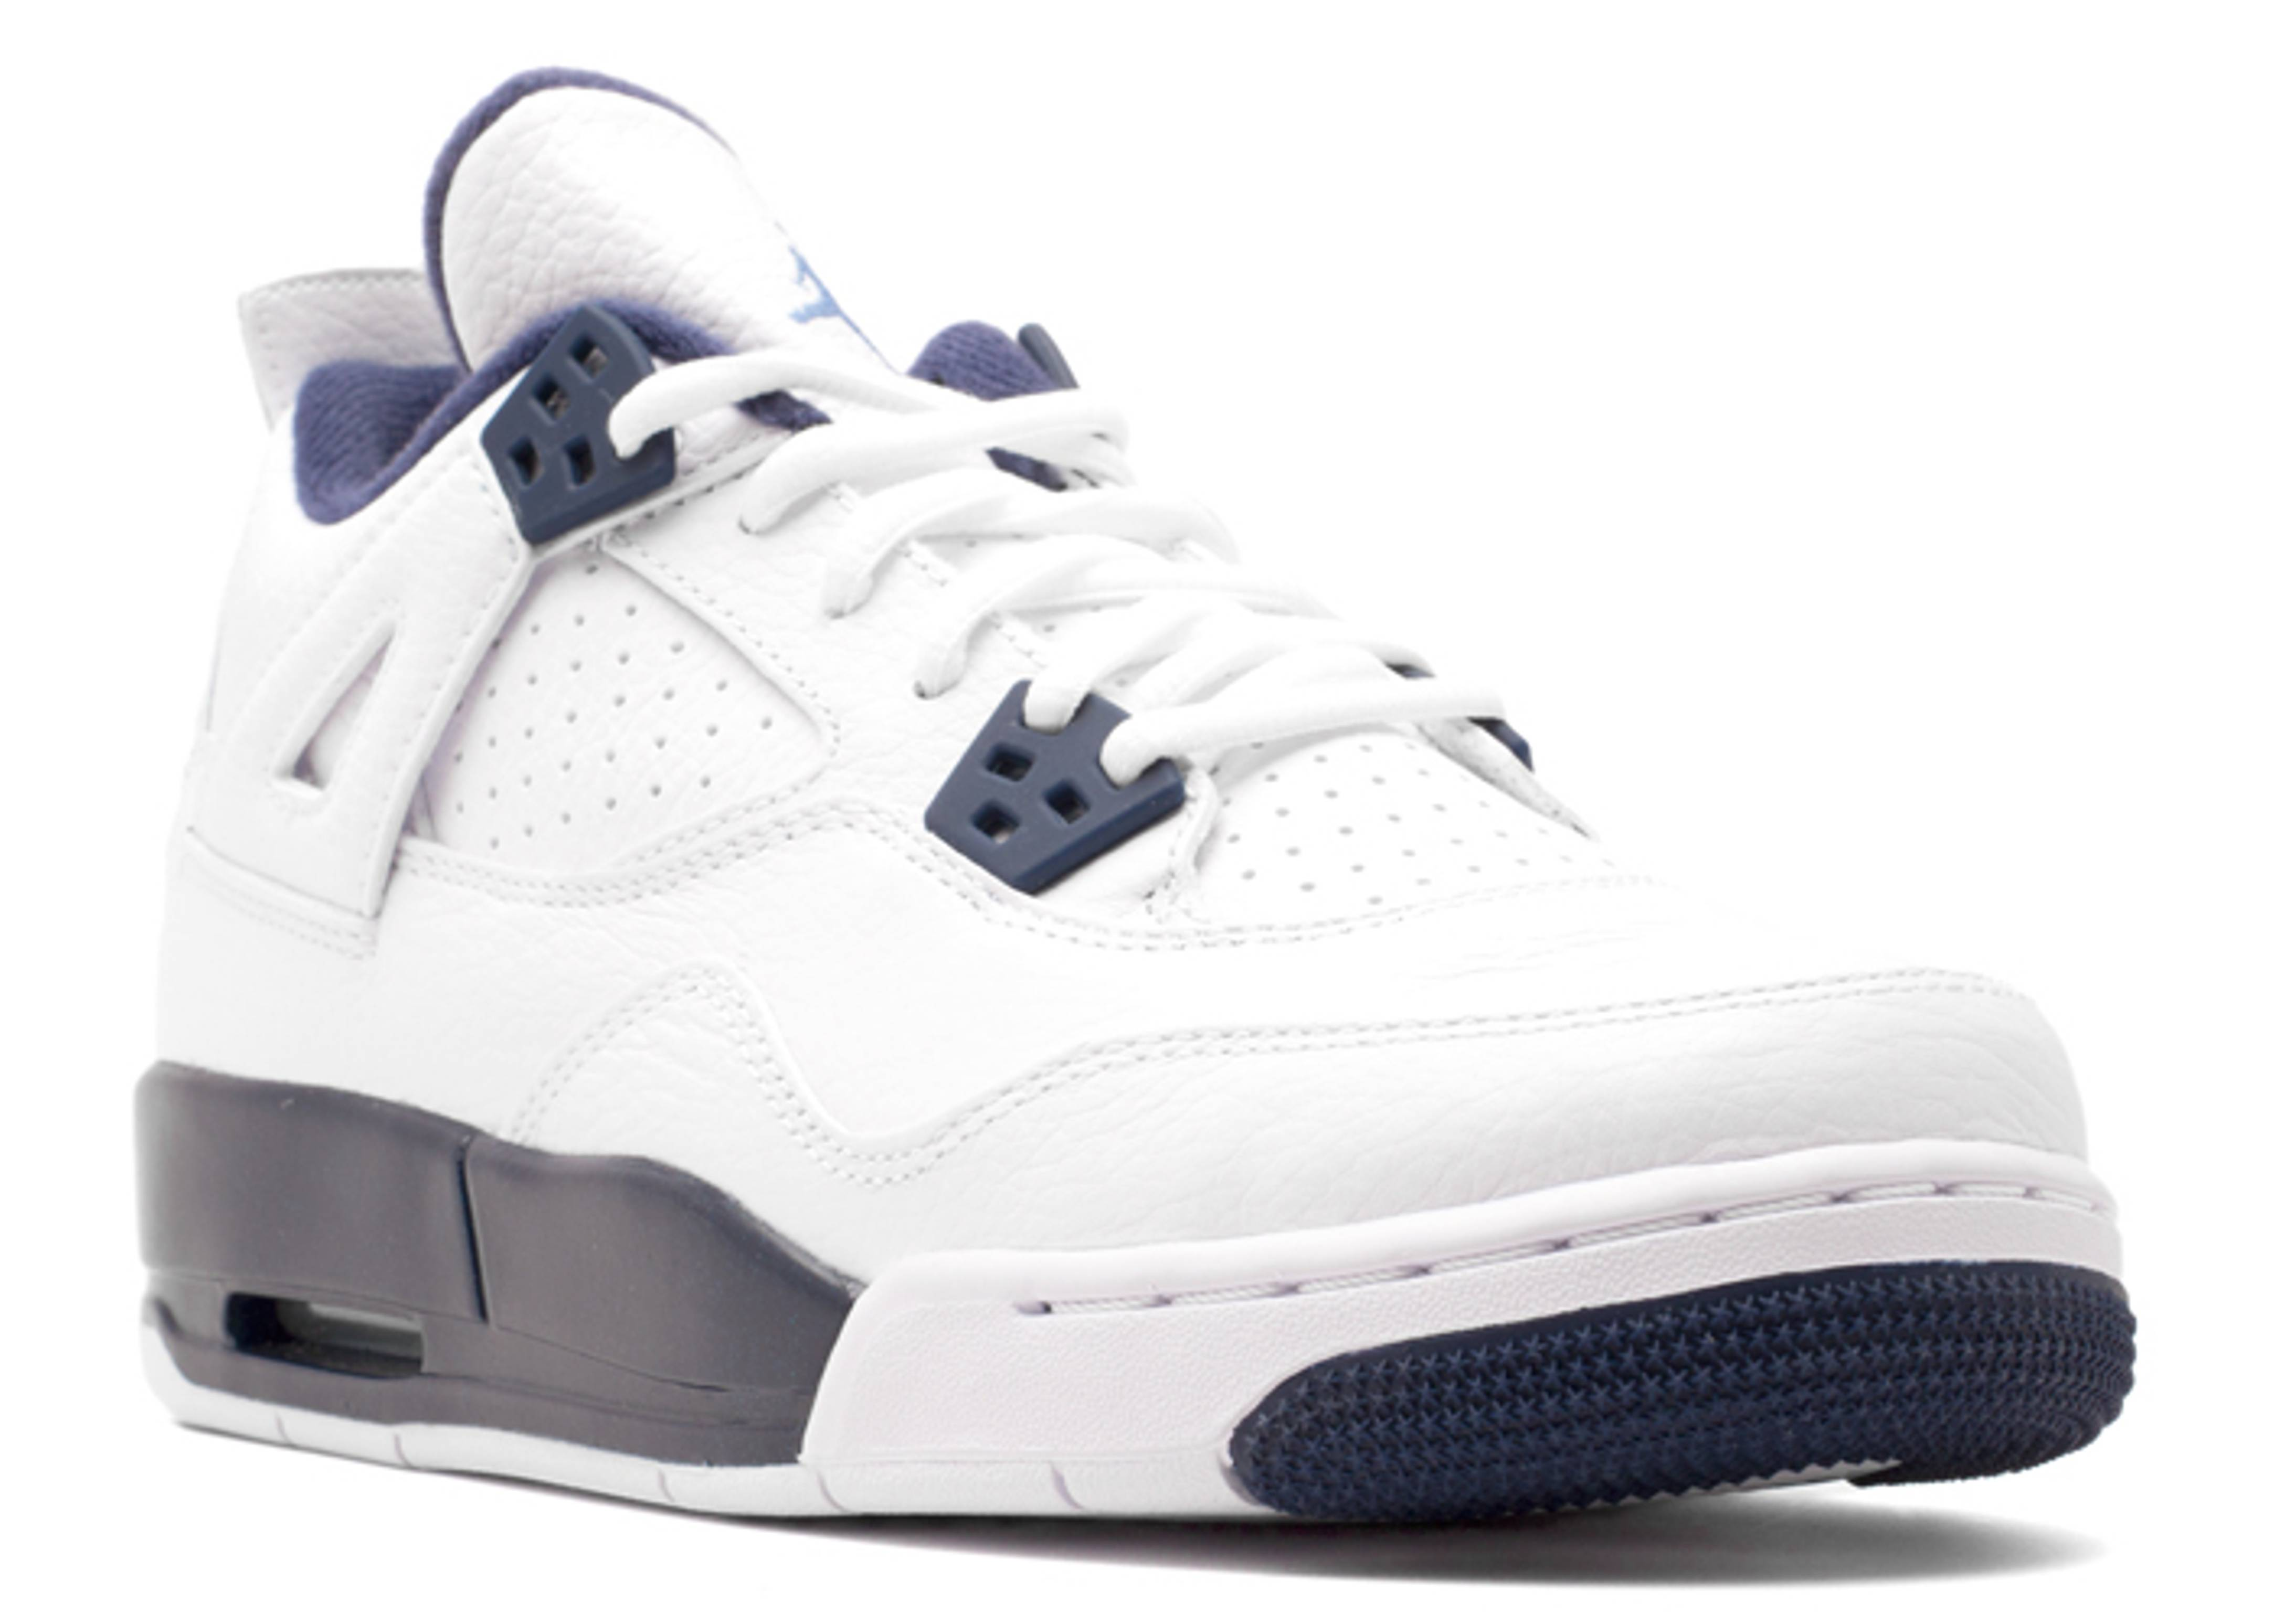 Nike Air Jordan 4 Retro Bg Gs White Legend Blue Midnight